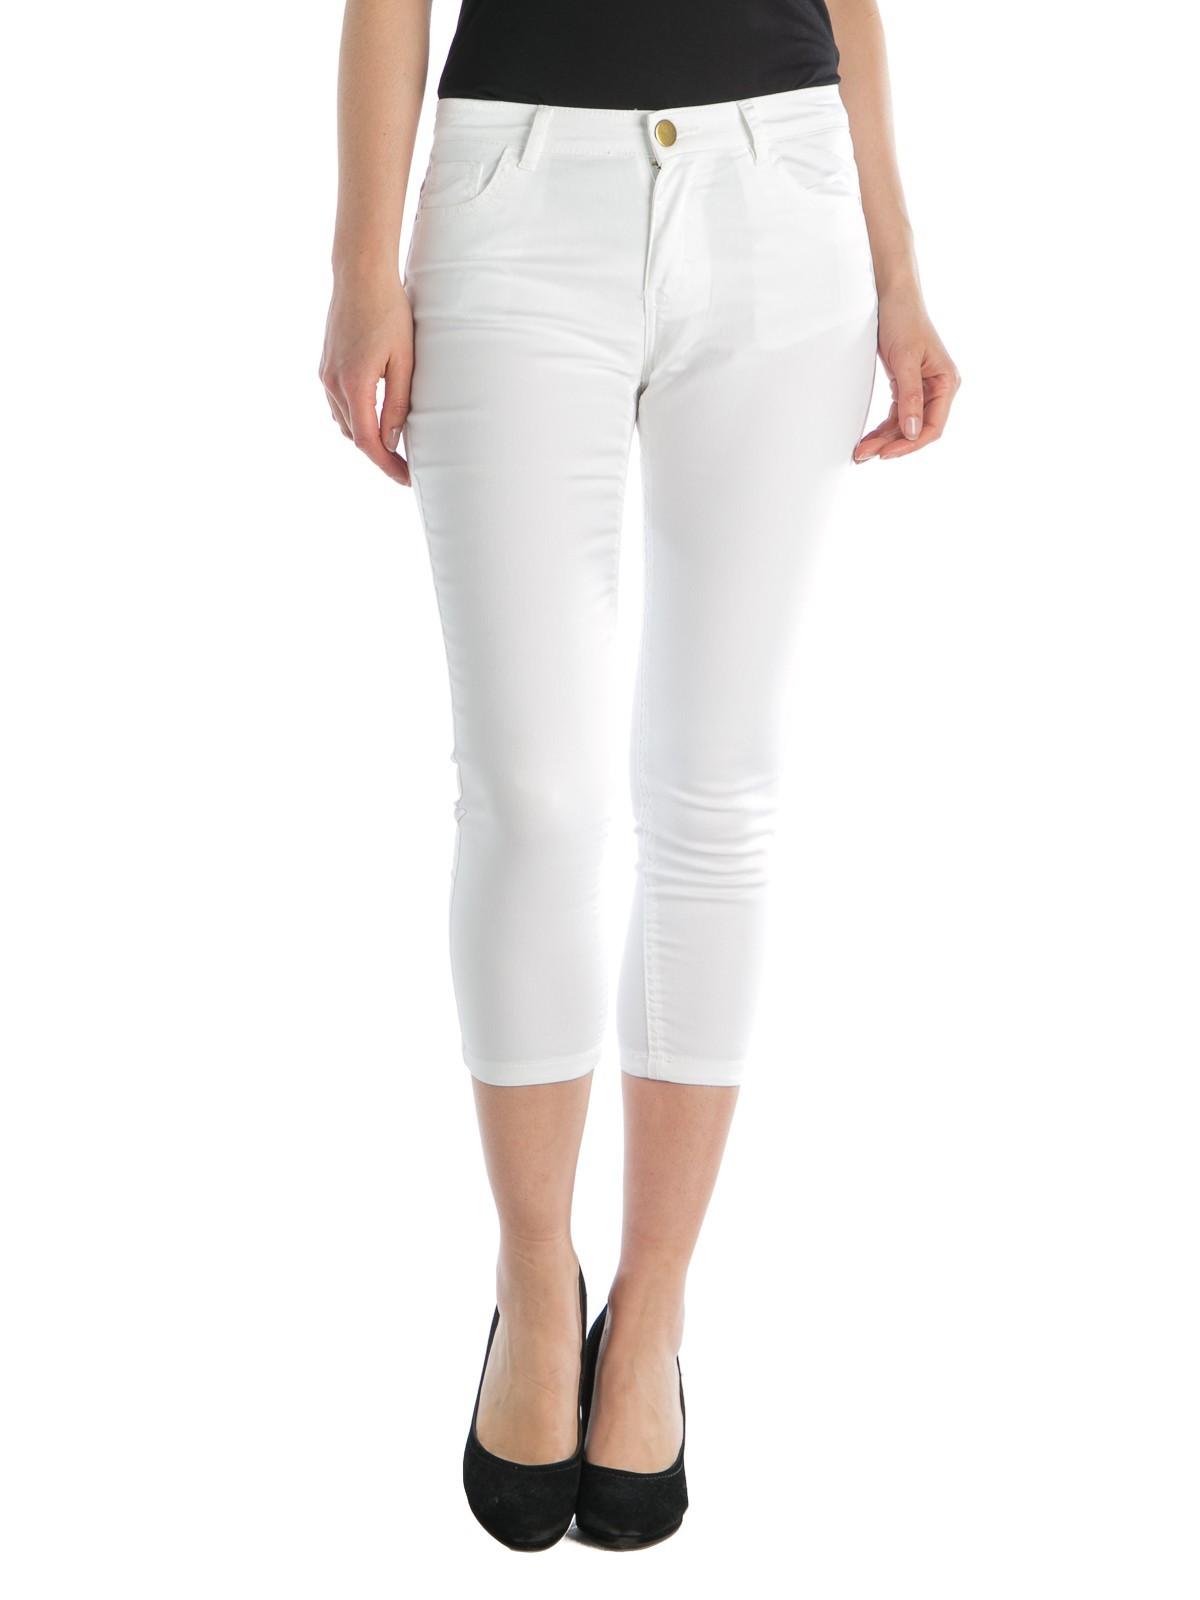 taille 40 c3550 00ff1 Pantacourt femme blanc - DistriCenter